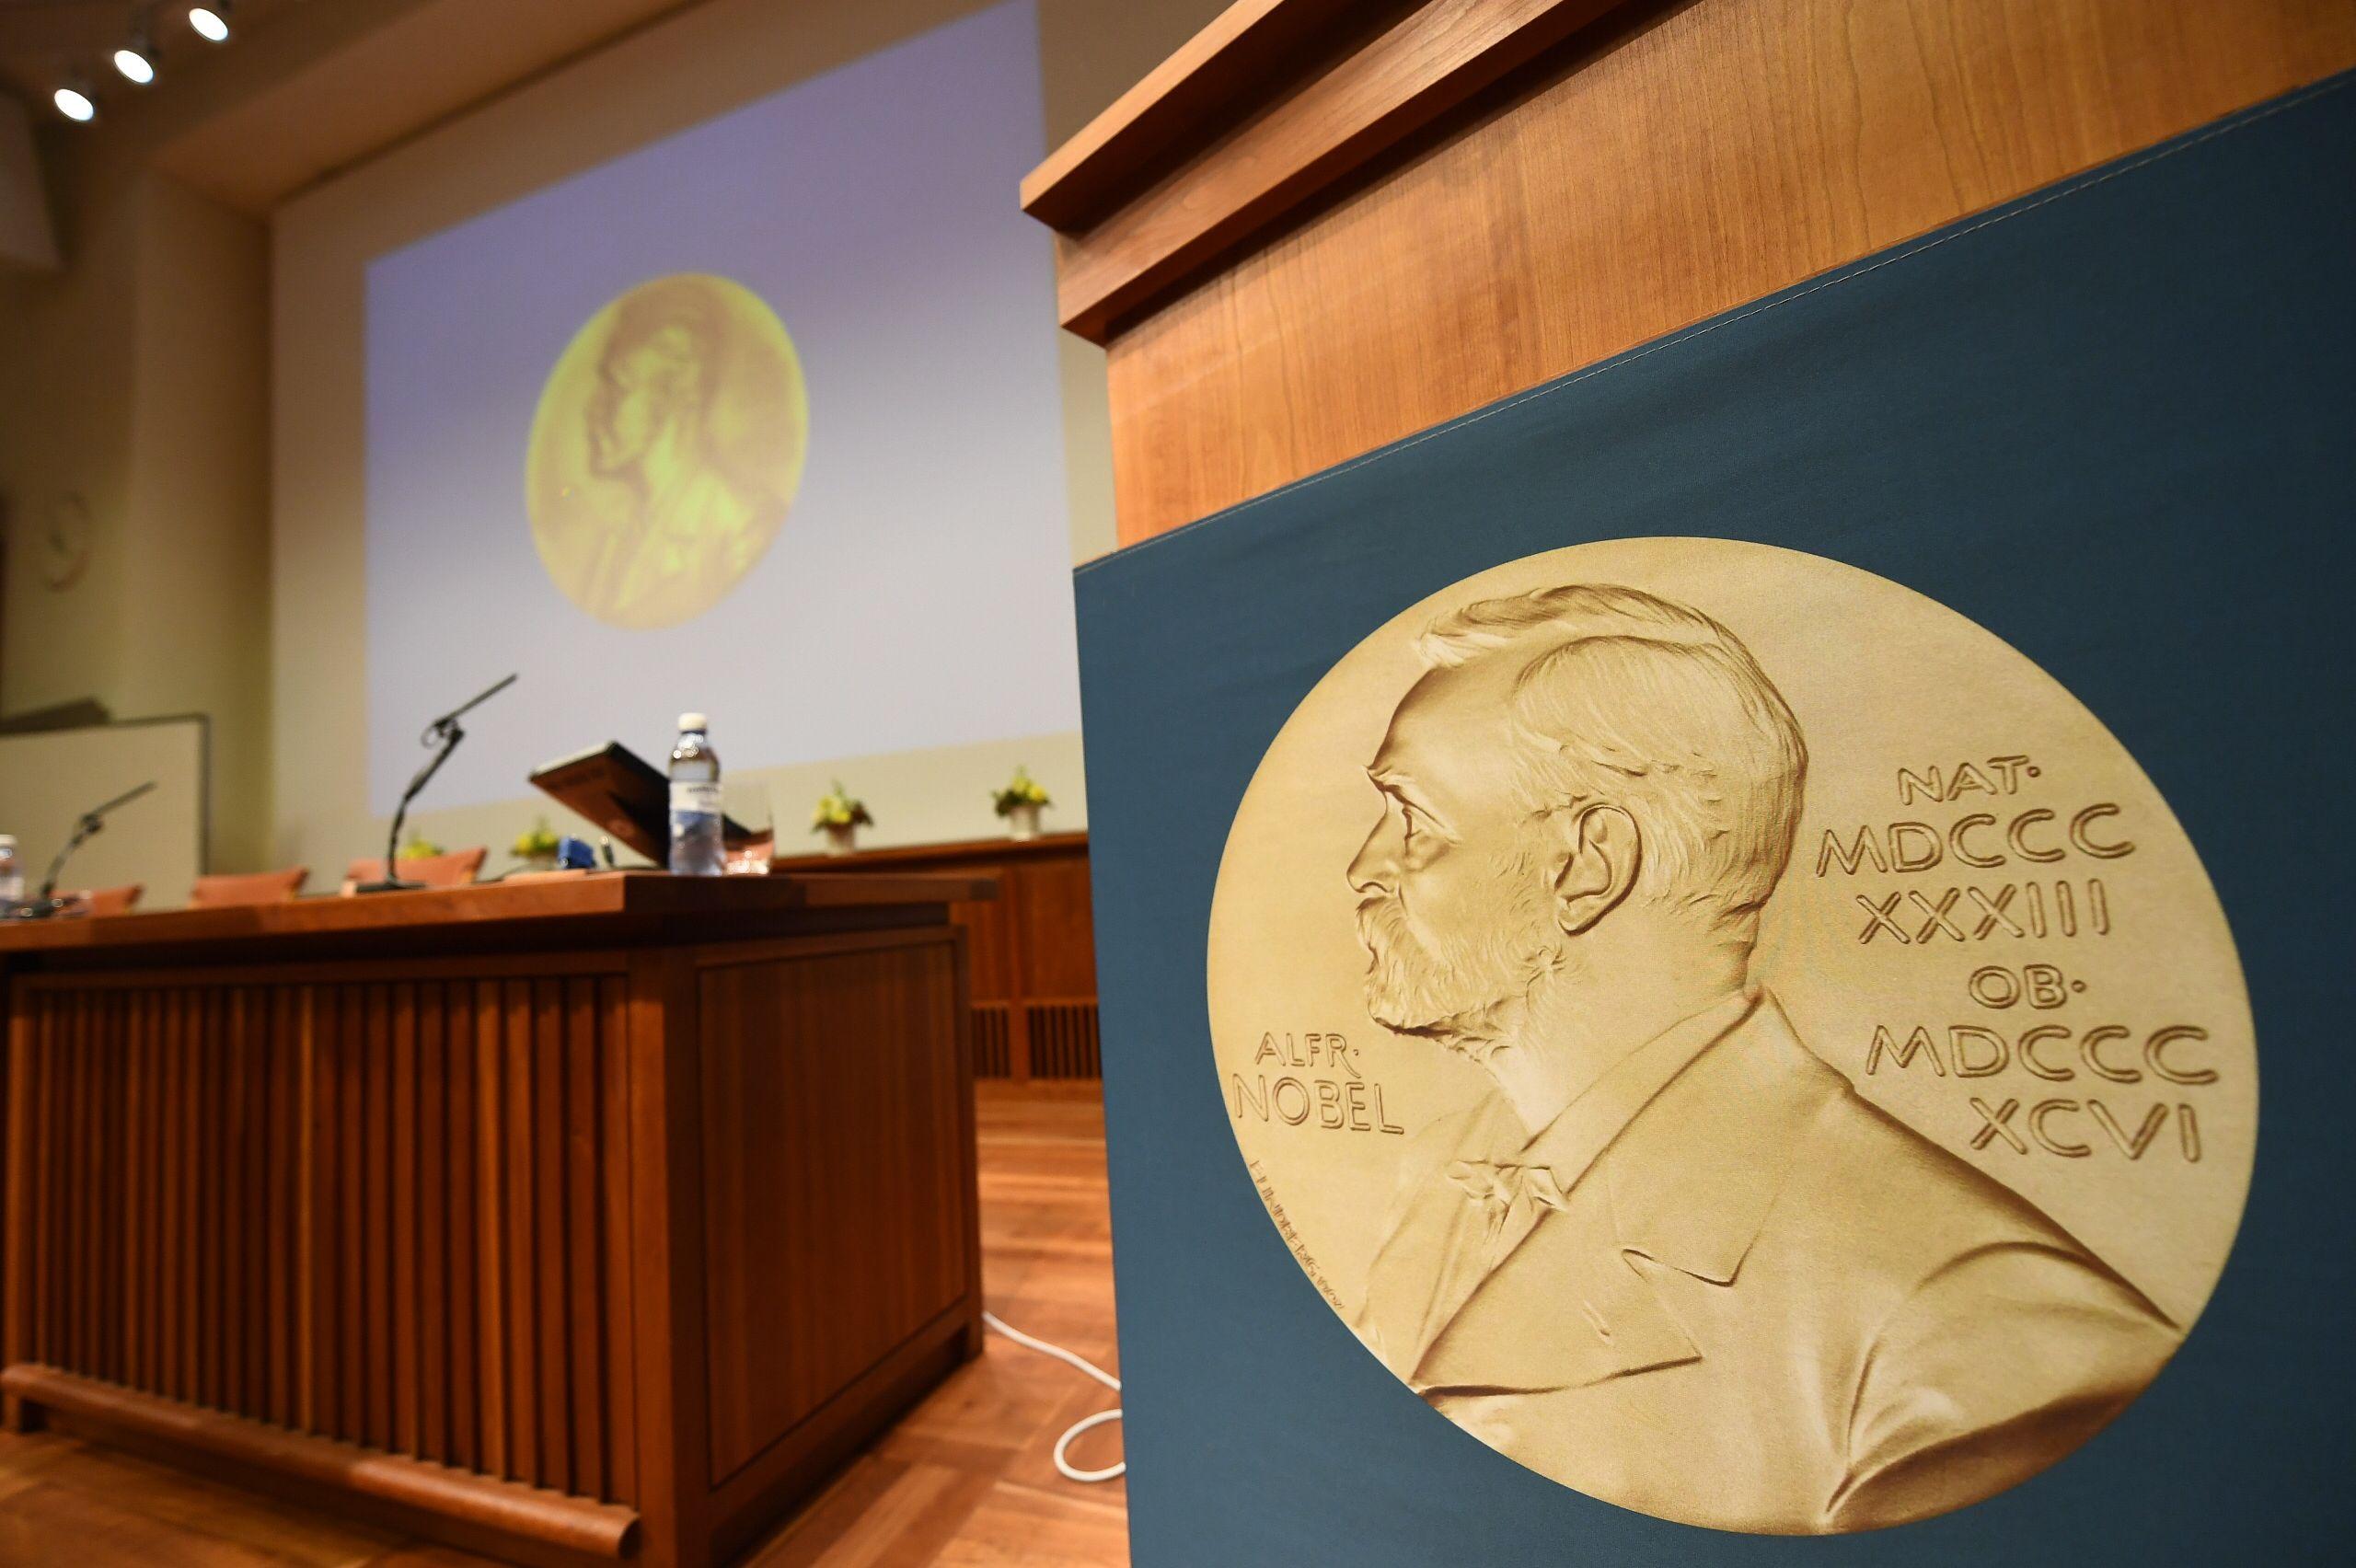 Медаль із зображенням Альфреда Нобеля